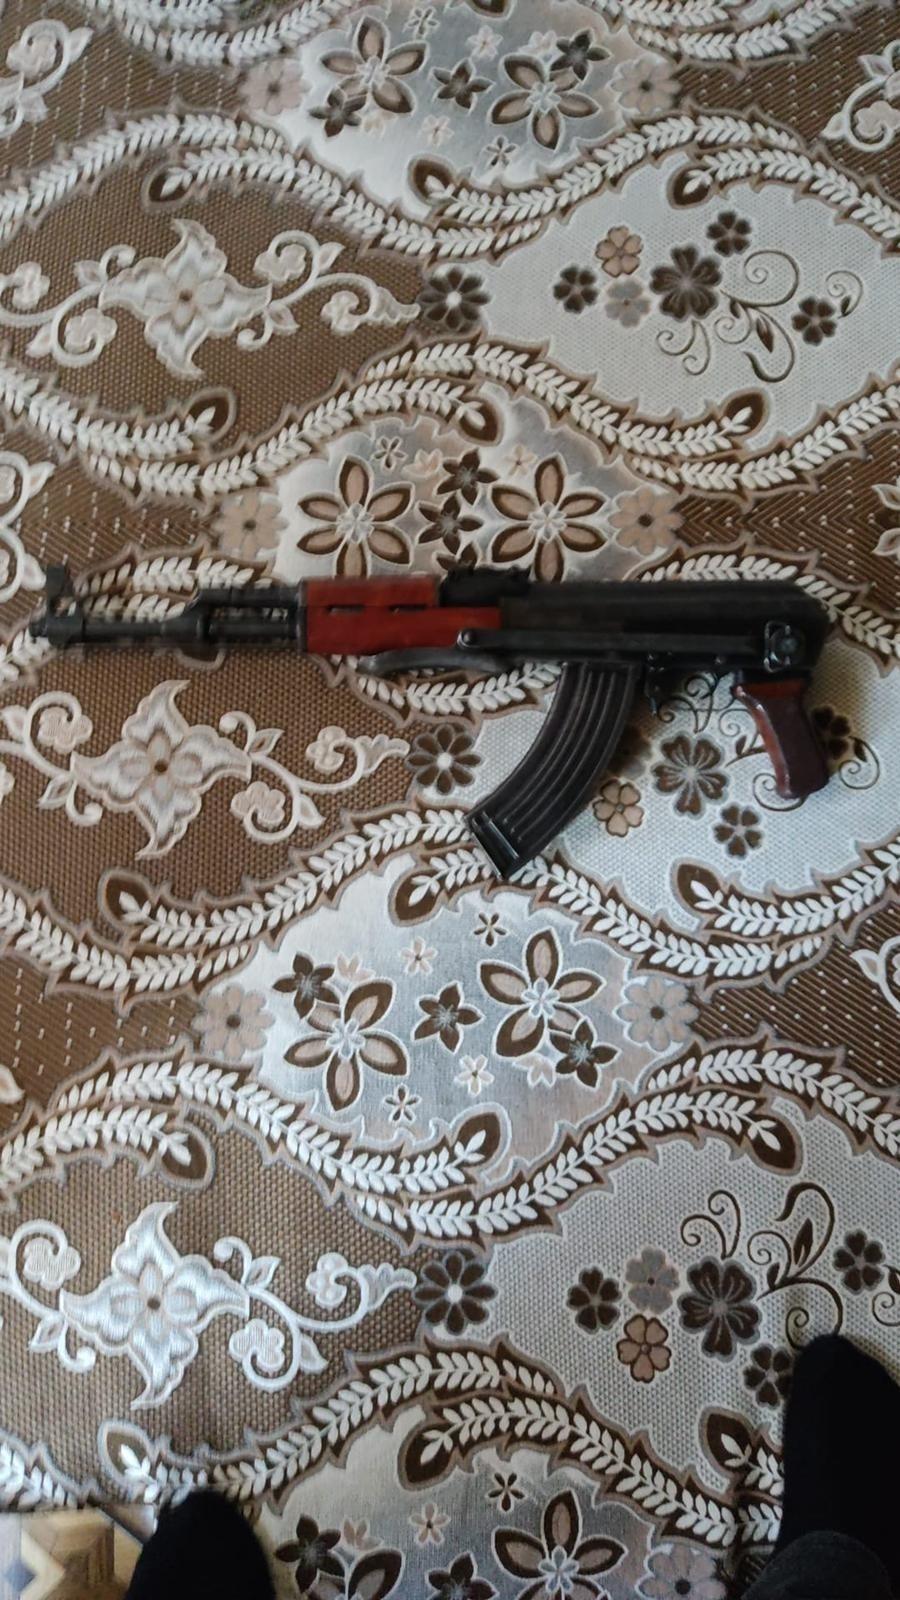 2021/04/silah-kacakciligi-operasyonu-20210427AW30-7.jpg